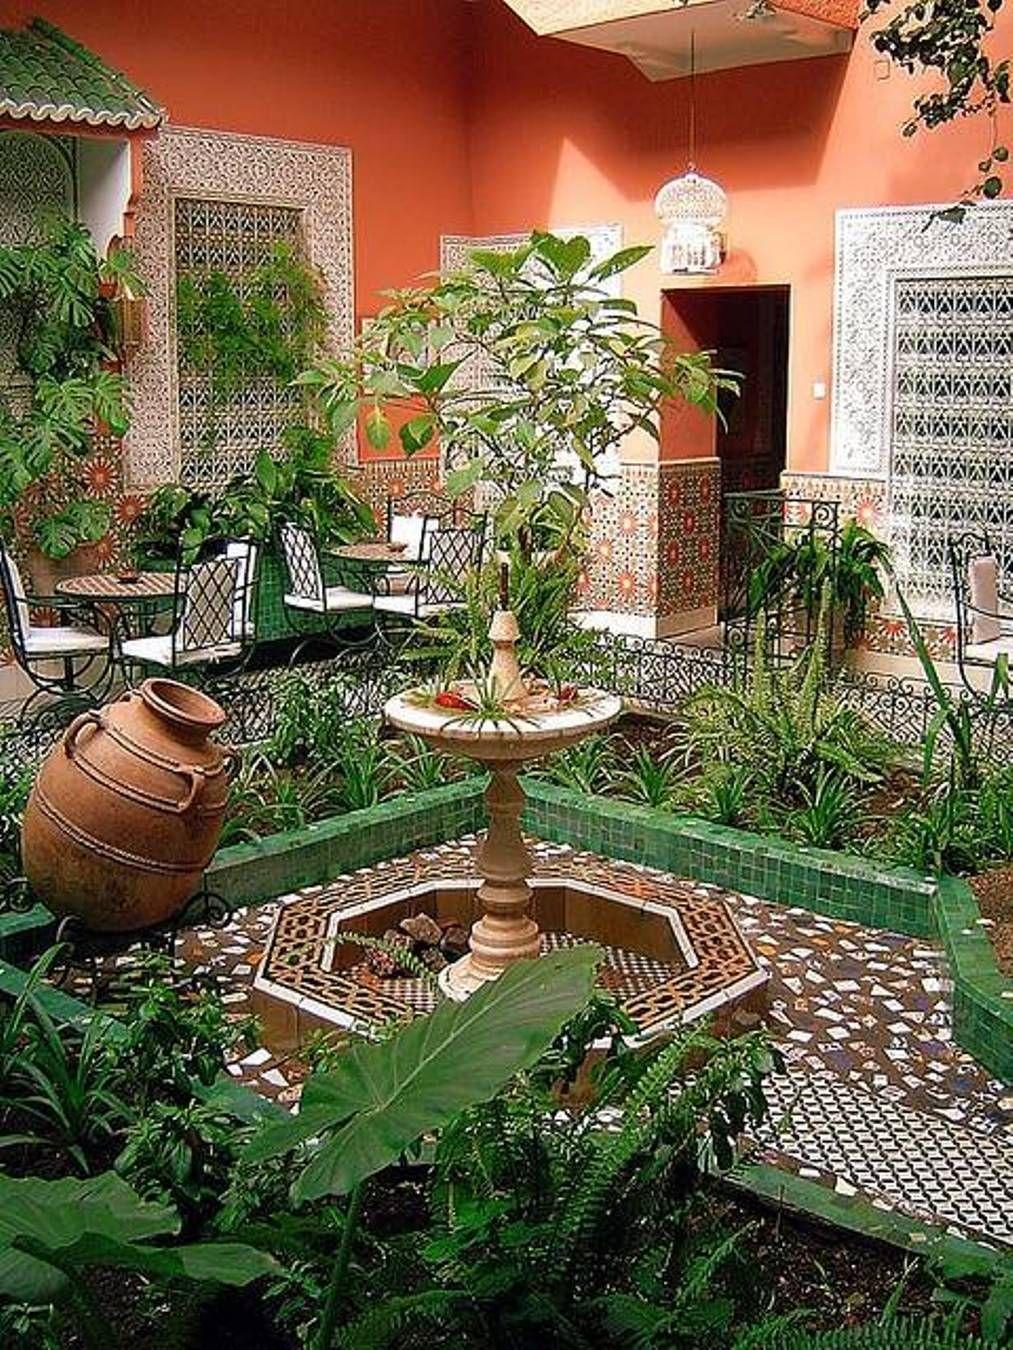 Garden And Lawn , Moroccan Home Gardens : Moroccan Home Gardens With ...